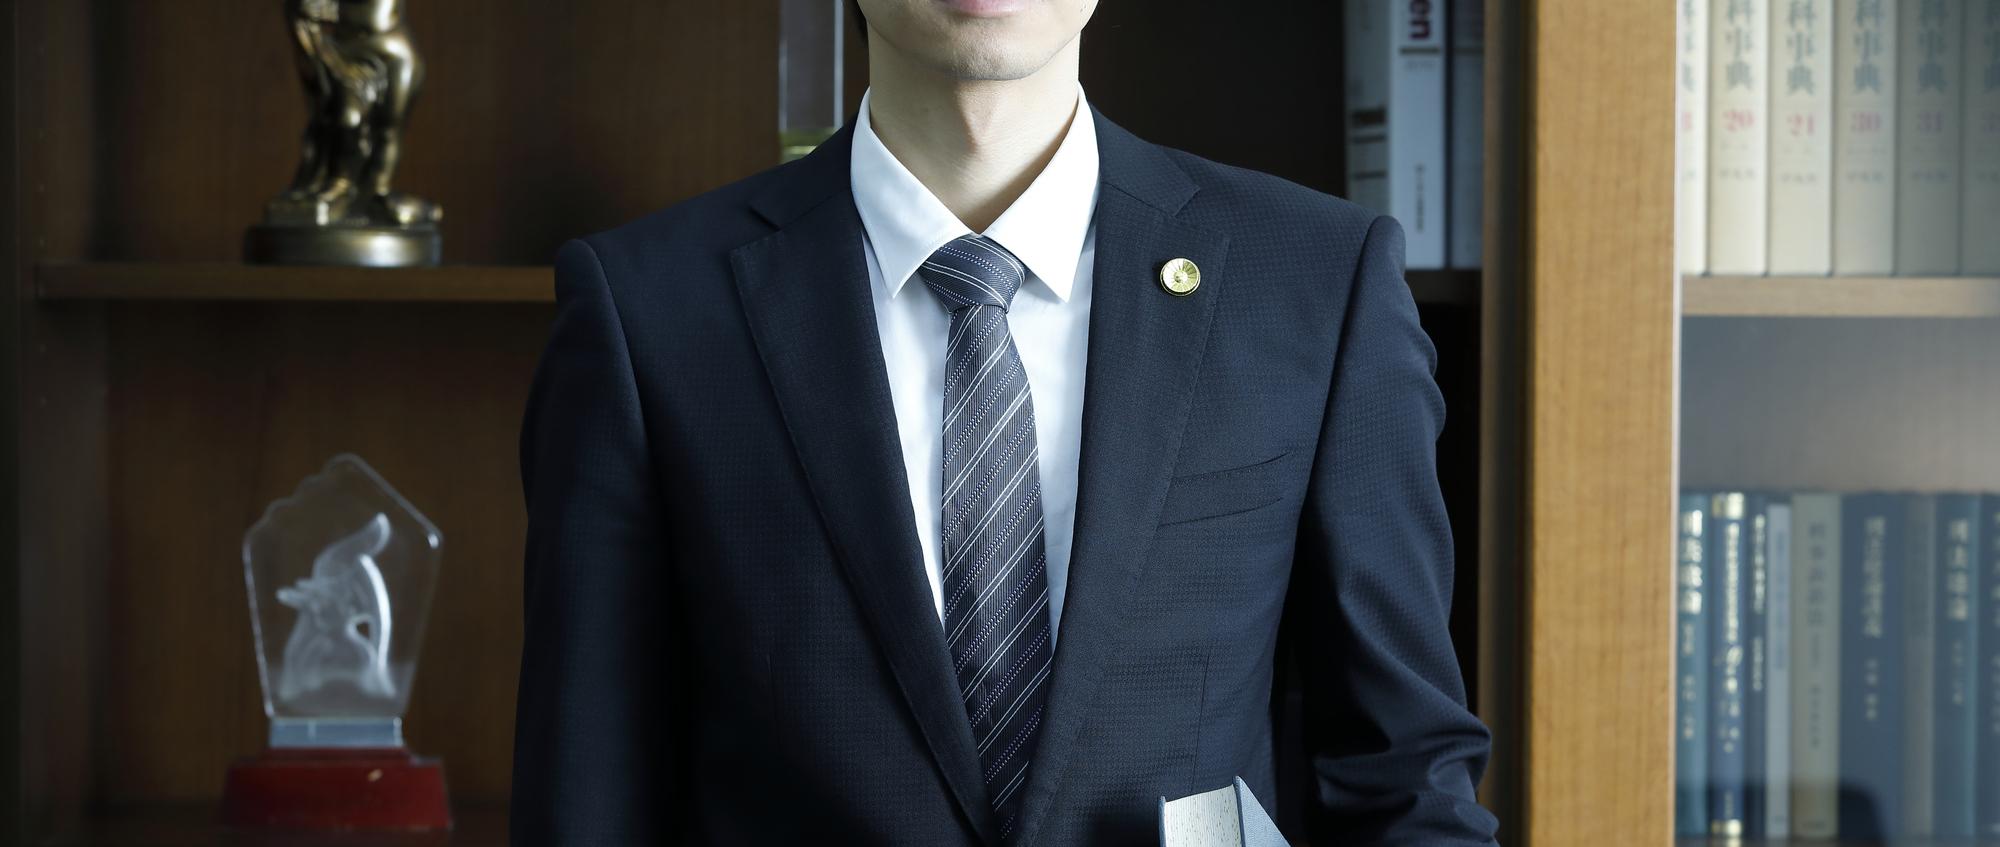 刑事事件弁護士ガイド